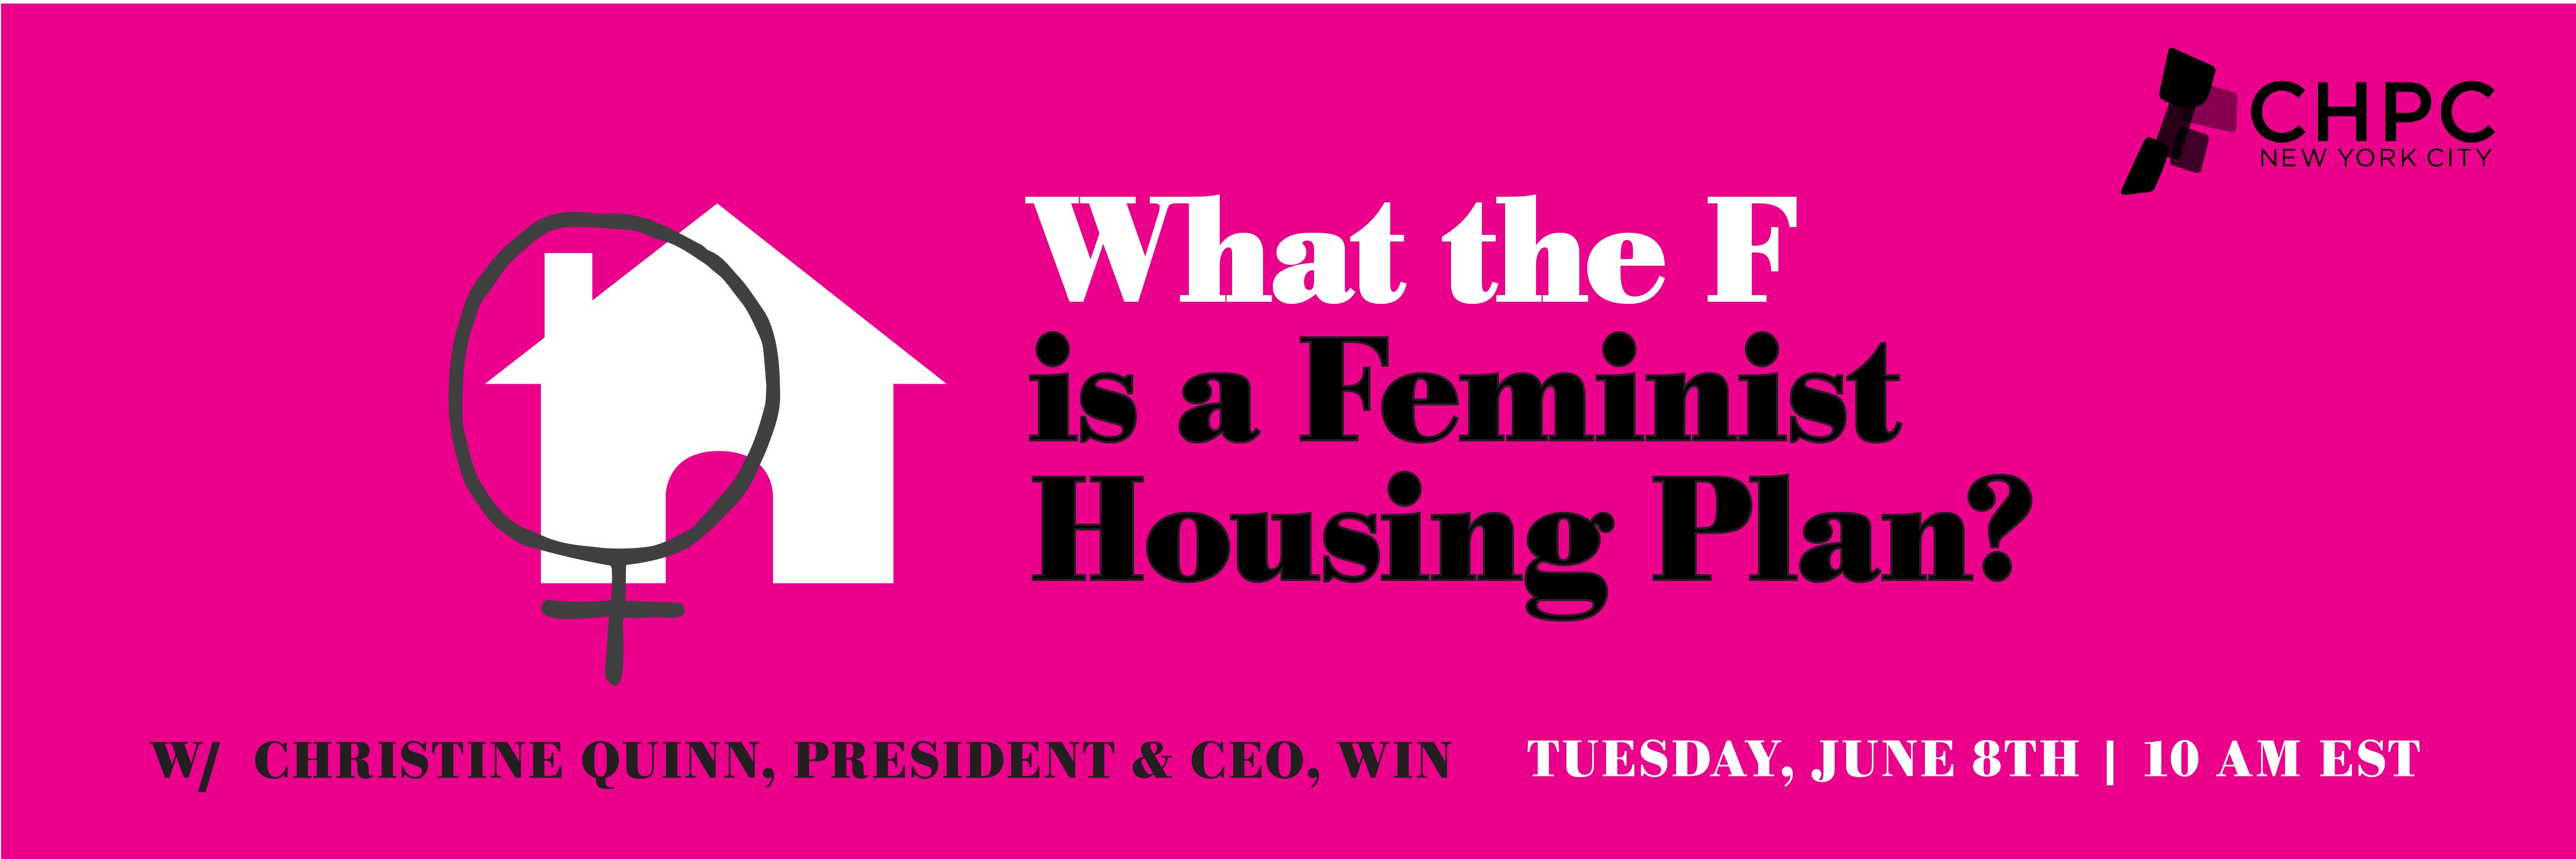 Feminist housing plan webinar with christine quinn